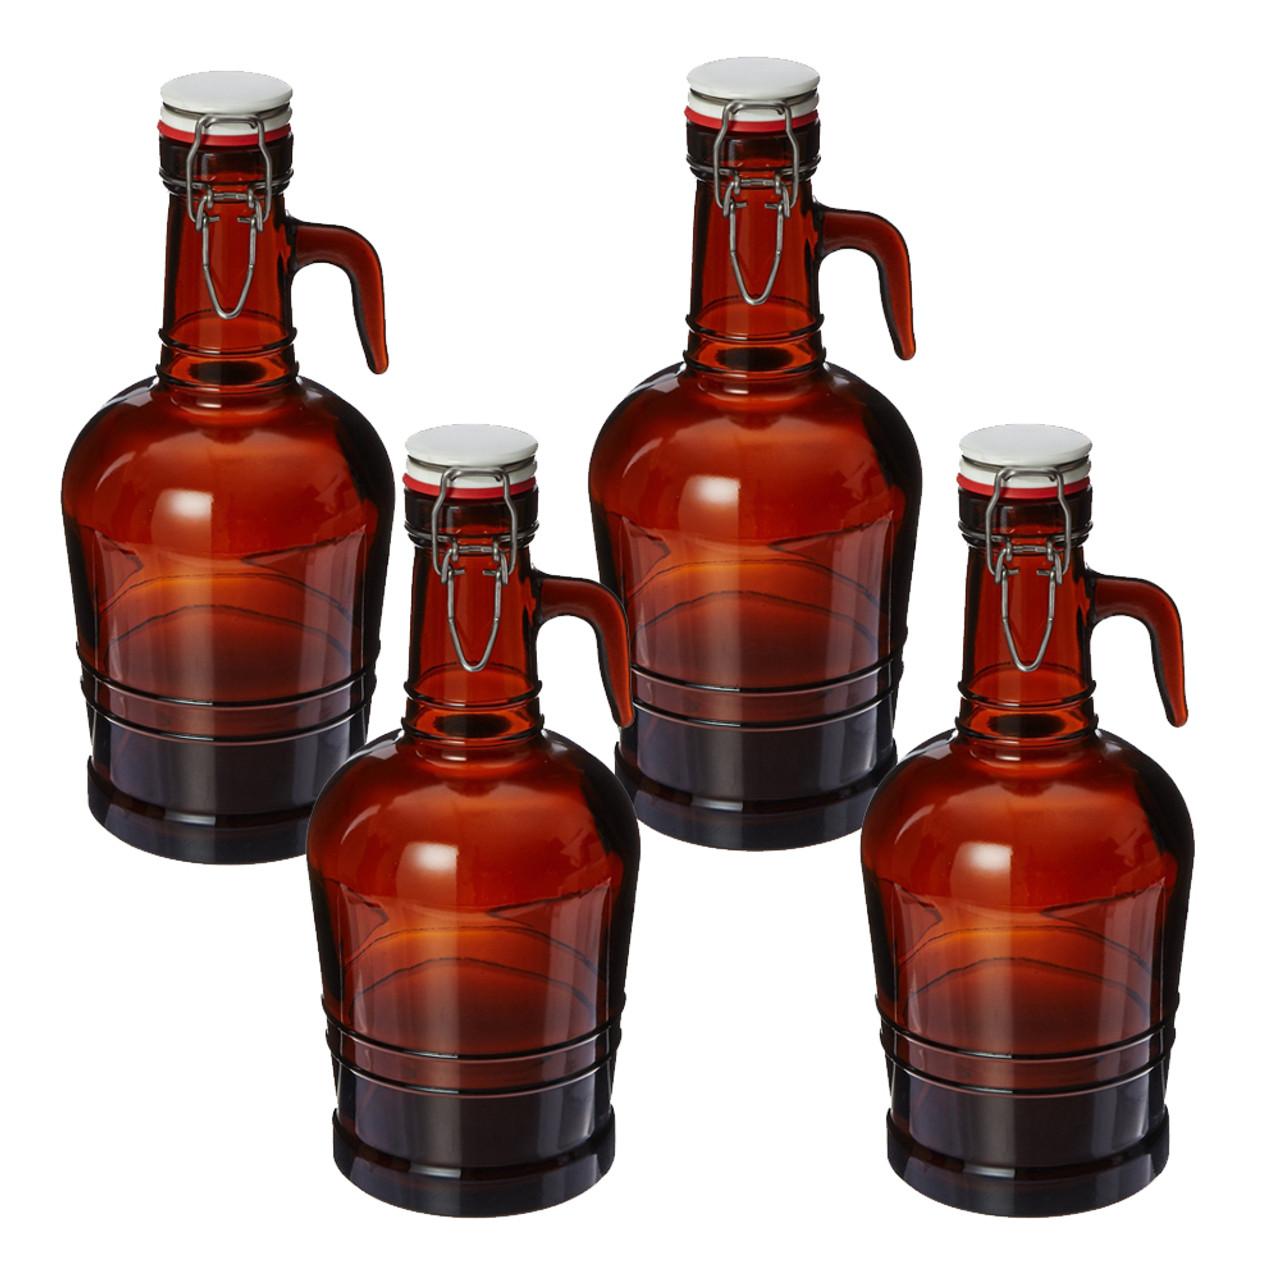 2 Liter Growler with Metal Handle Amber